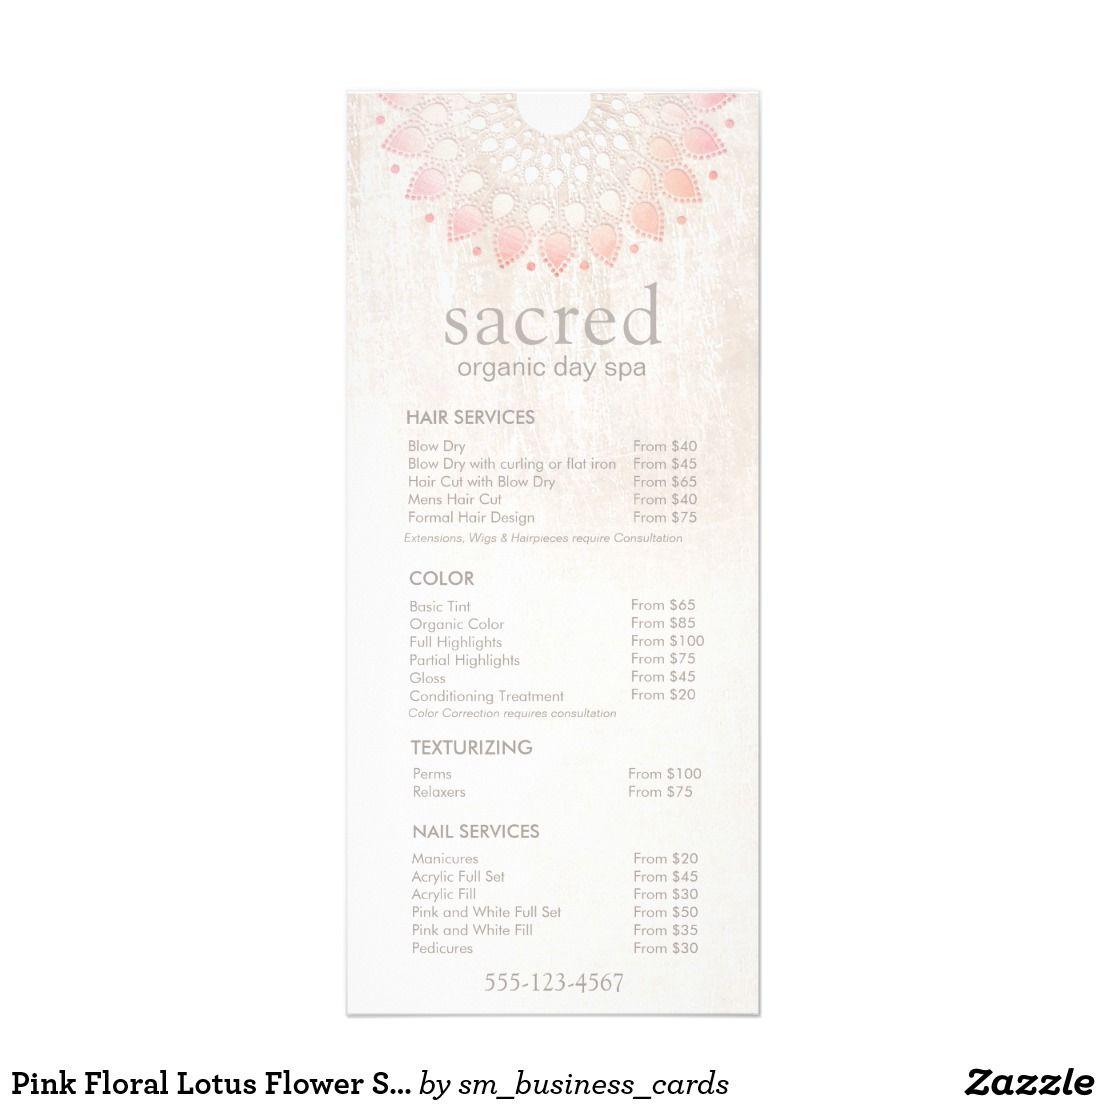 Pink Floral Lotus Flower Spa Salon Price List Menu | Price list and ...